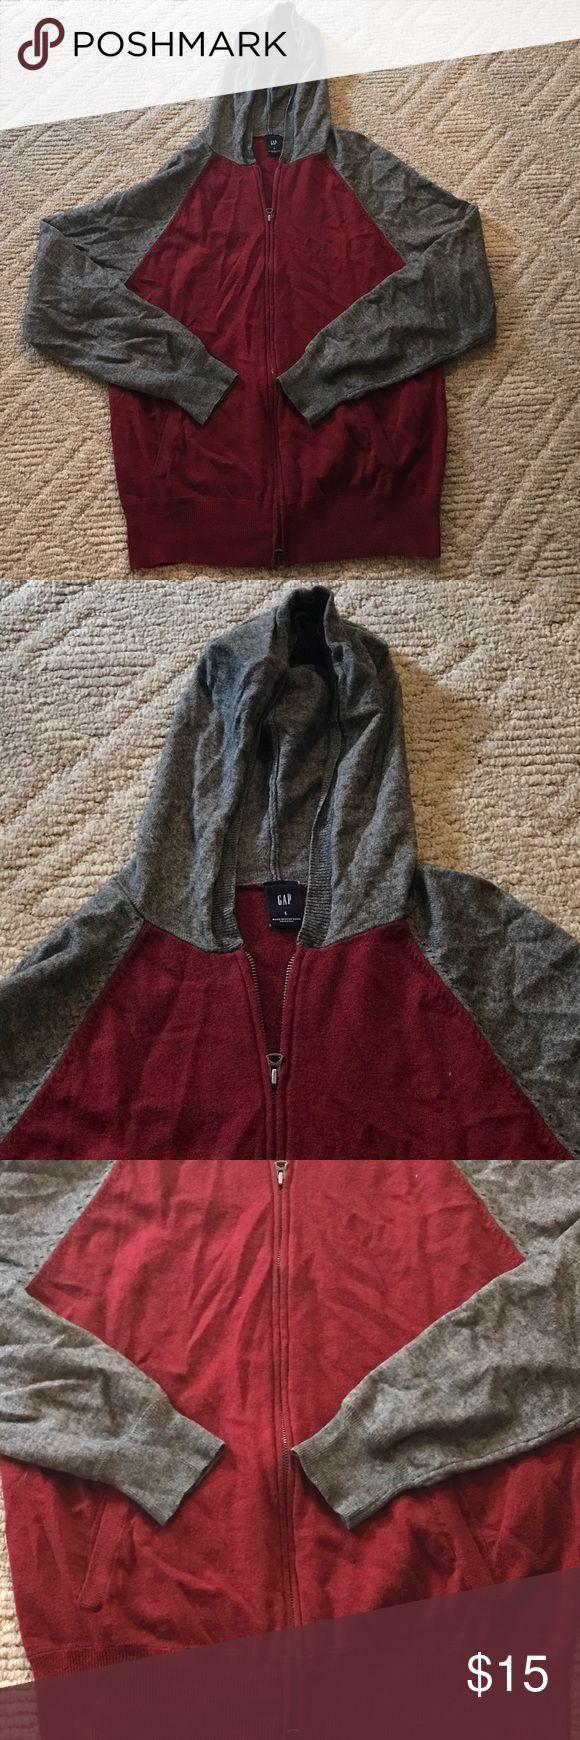 Men's gap jacket size large Men's gap jacket size large. Great condition. GAP Jackets & Coats